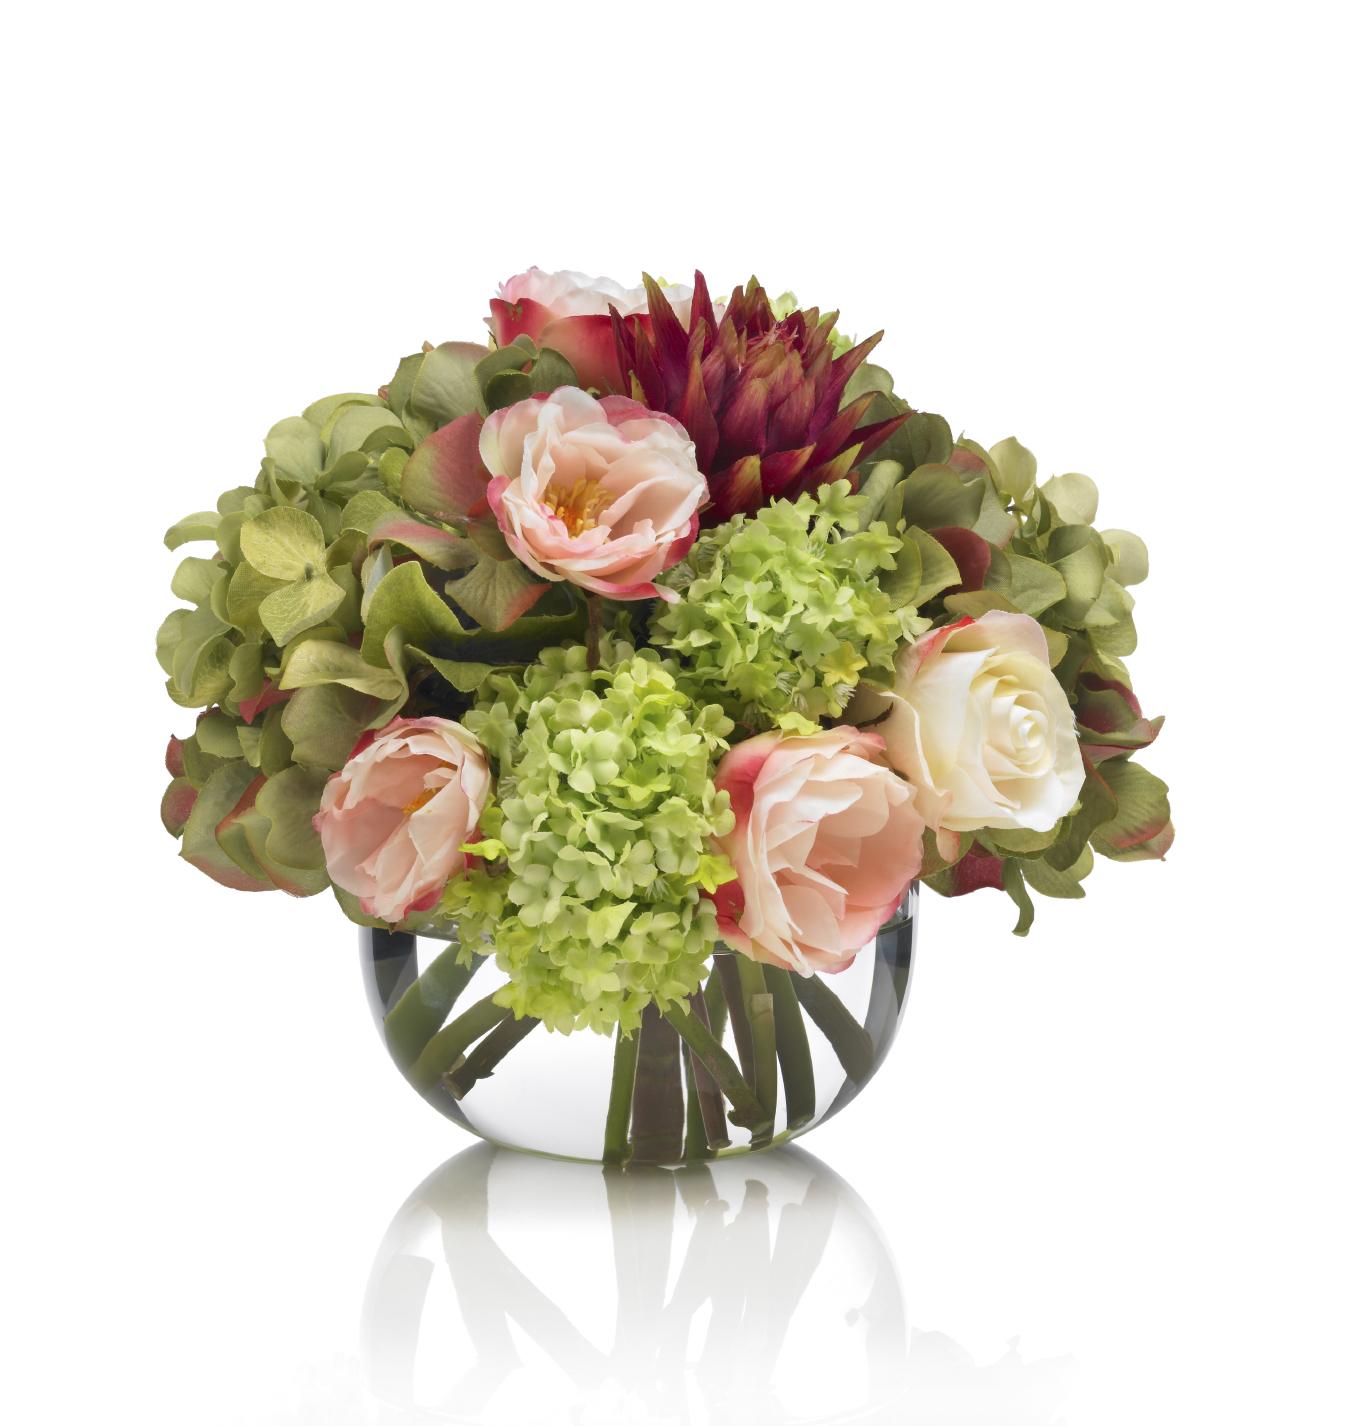 flower arrangement istock (1).jpg